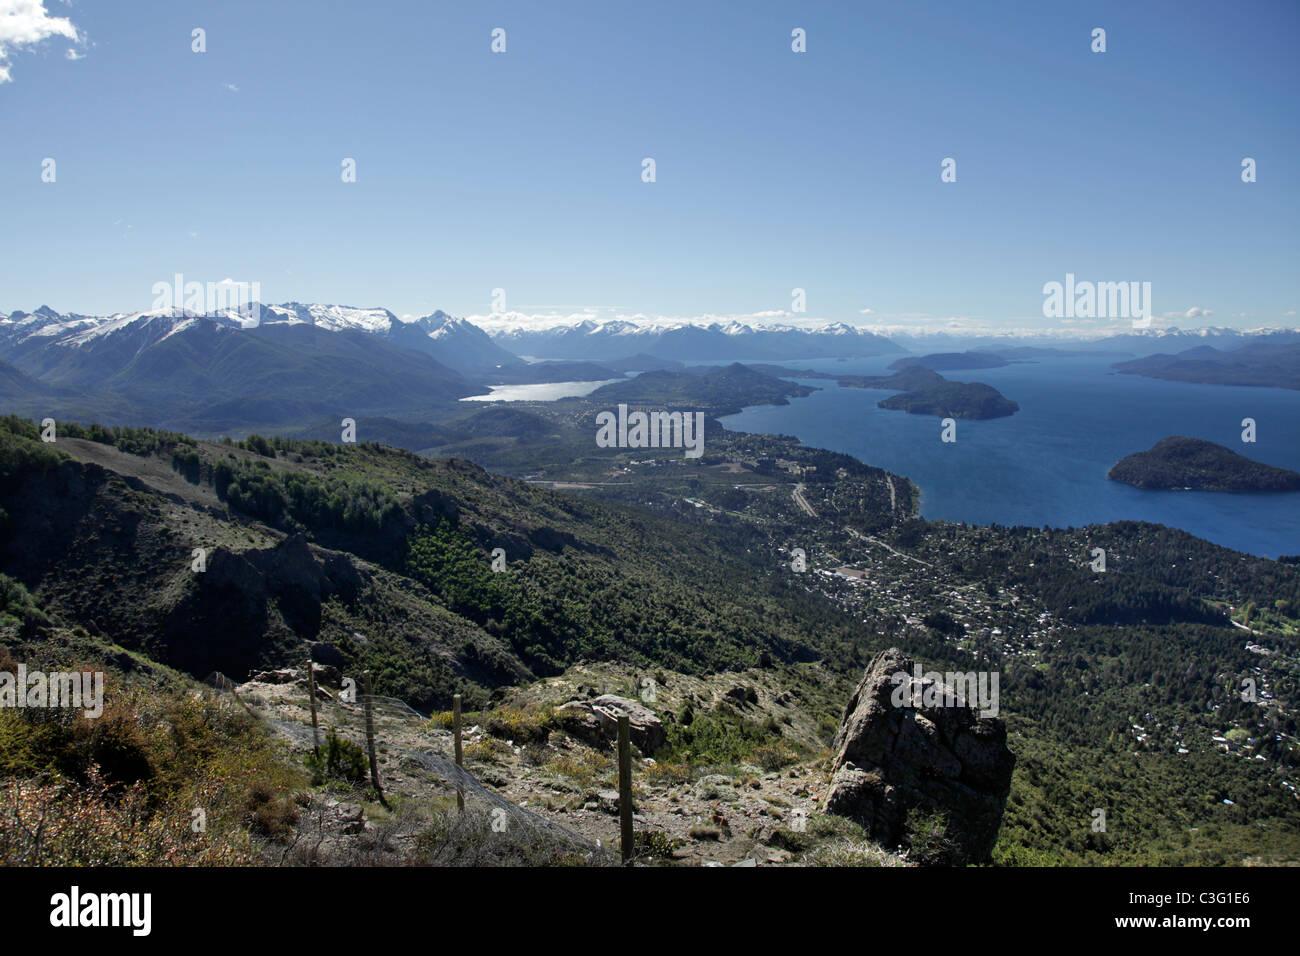 View of San Carols de Bariloche and Lake Nahuel Huapi, from Cerro Otto, Patagonia, Argentina, South America. - Stock Image